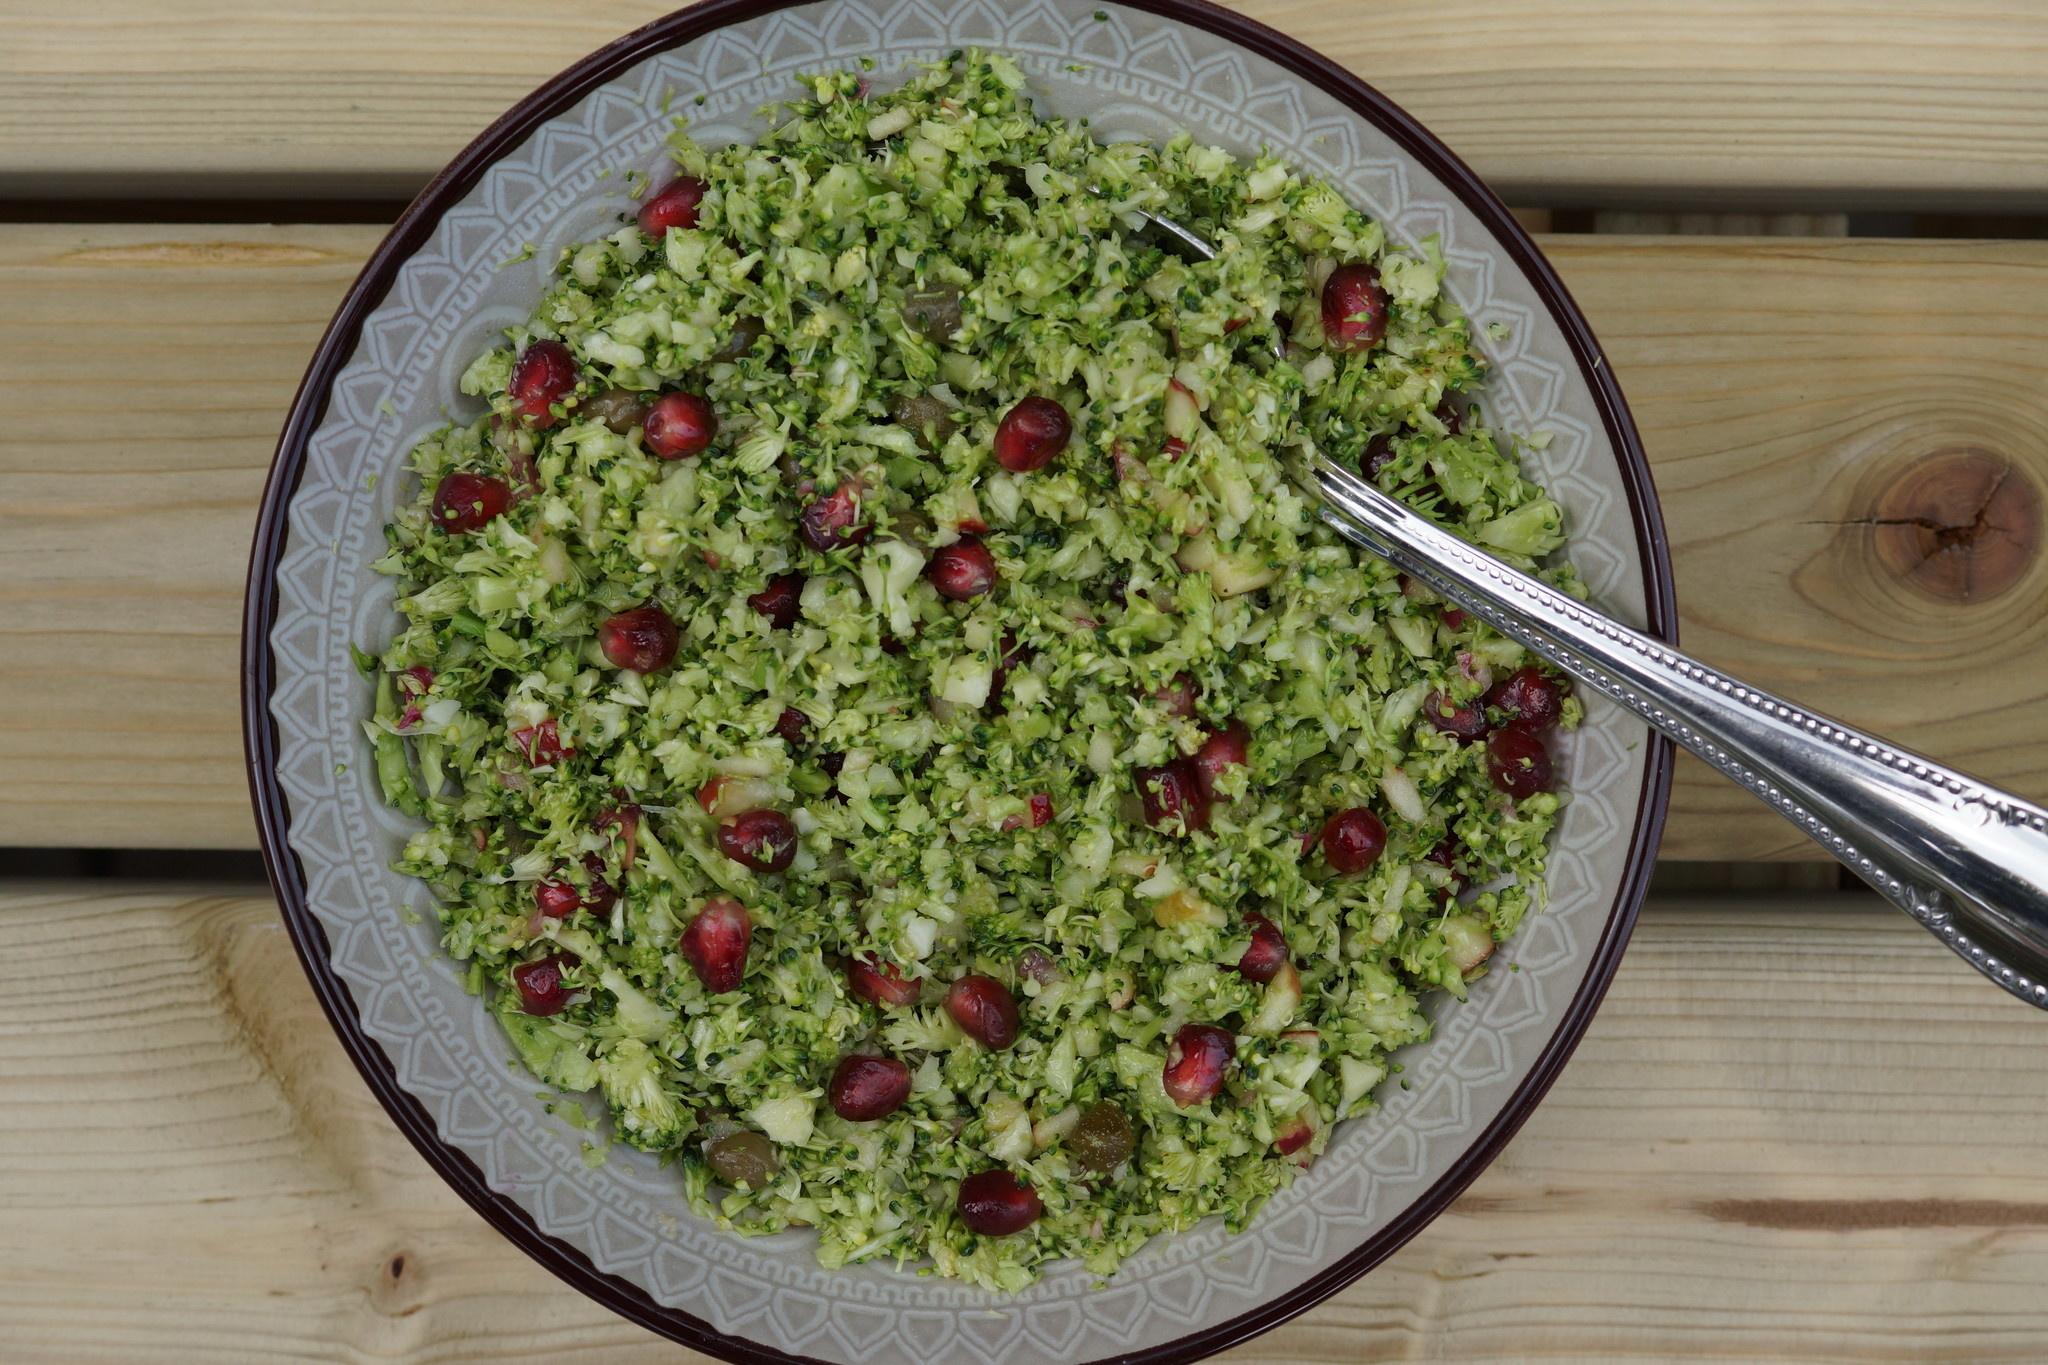 Broccolicouscous